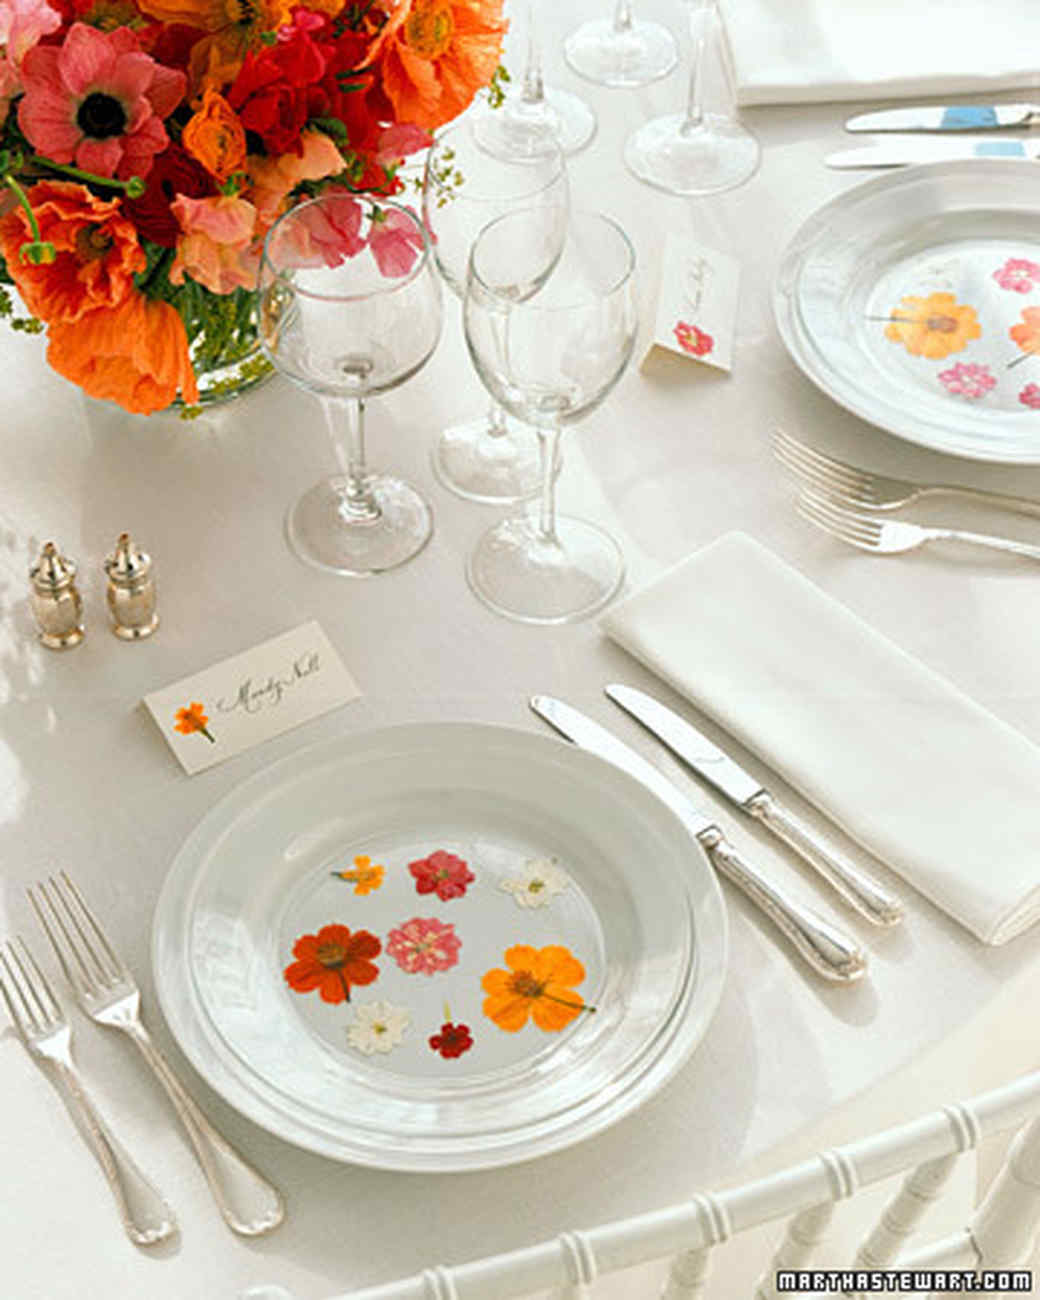 Pressed-Flower Plates